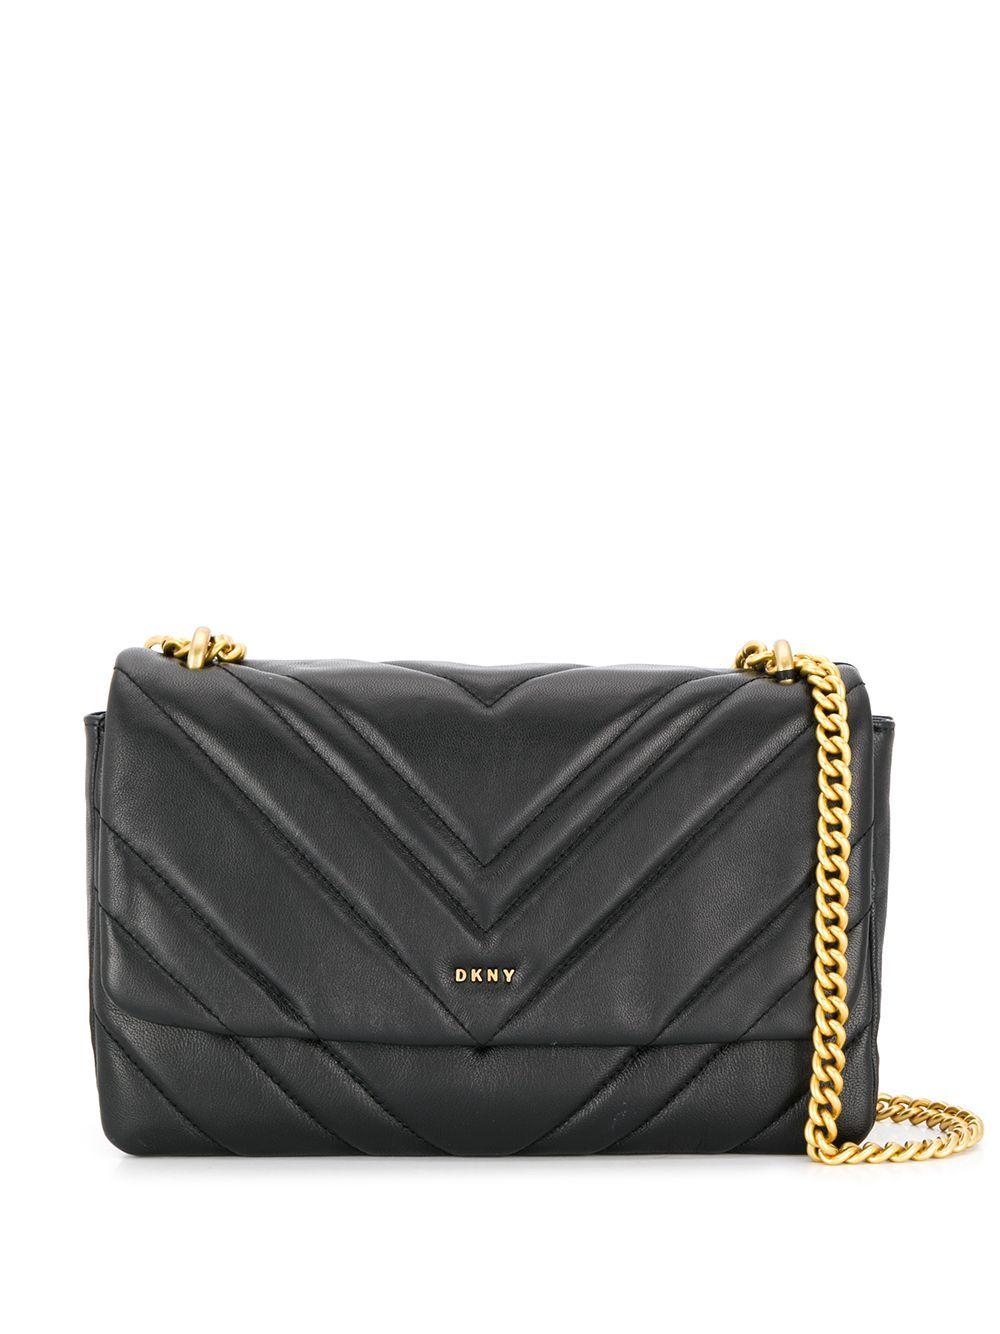 Dkny Vivian Quilted Crossbody Bag In Black Modesens